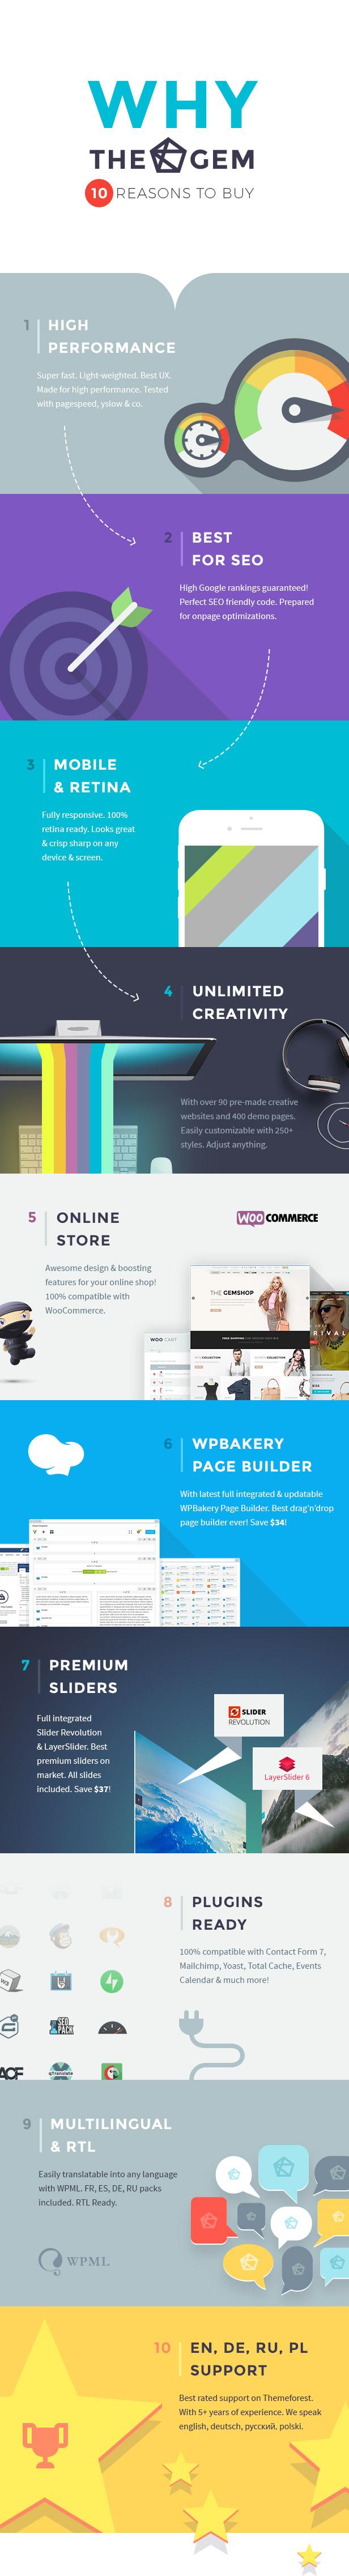 TheGem - Creative Multi-Purpose High-Performance WordPress Theme - 3